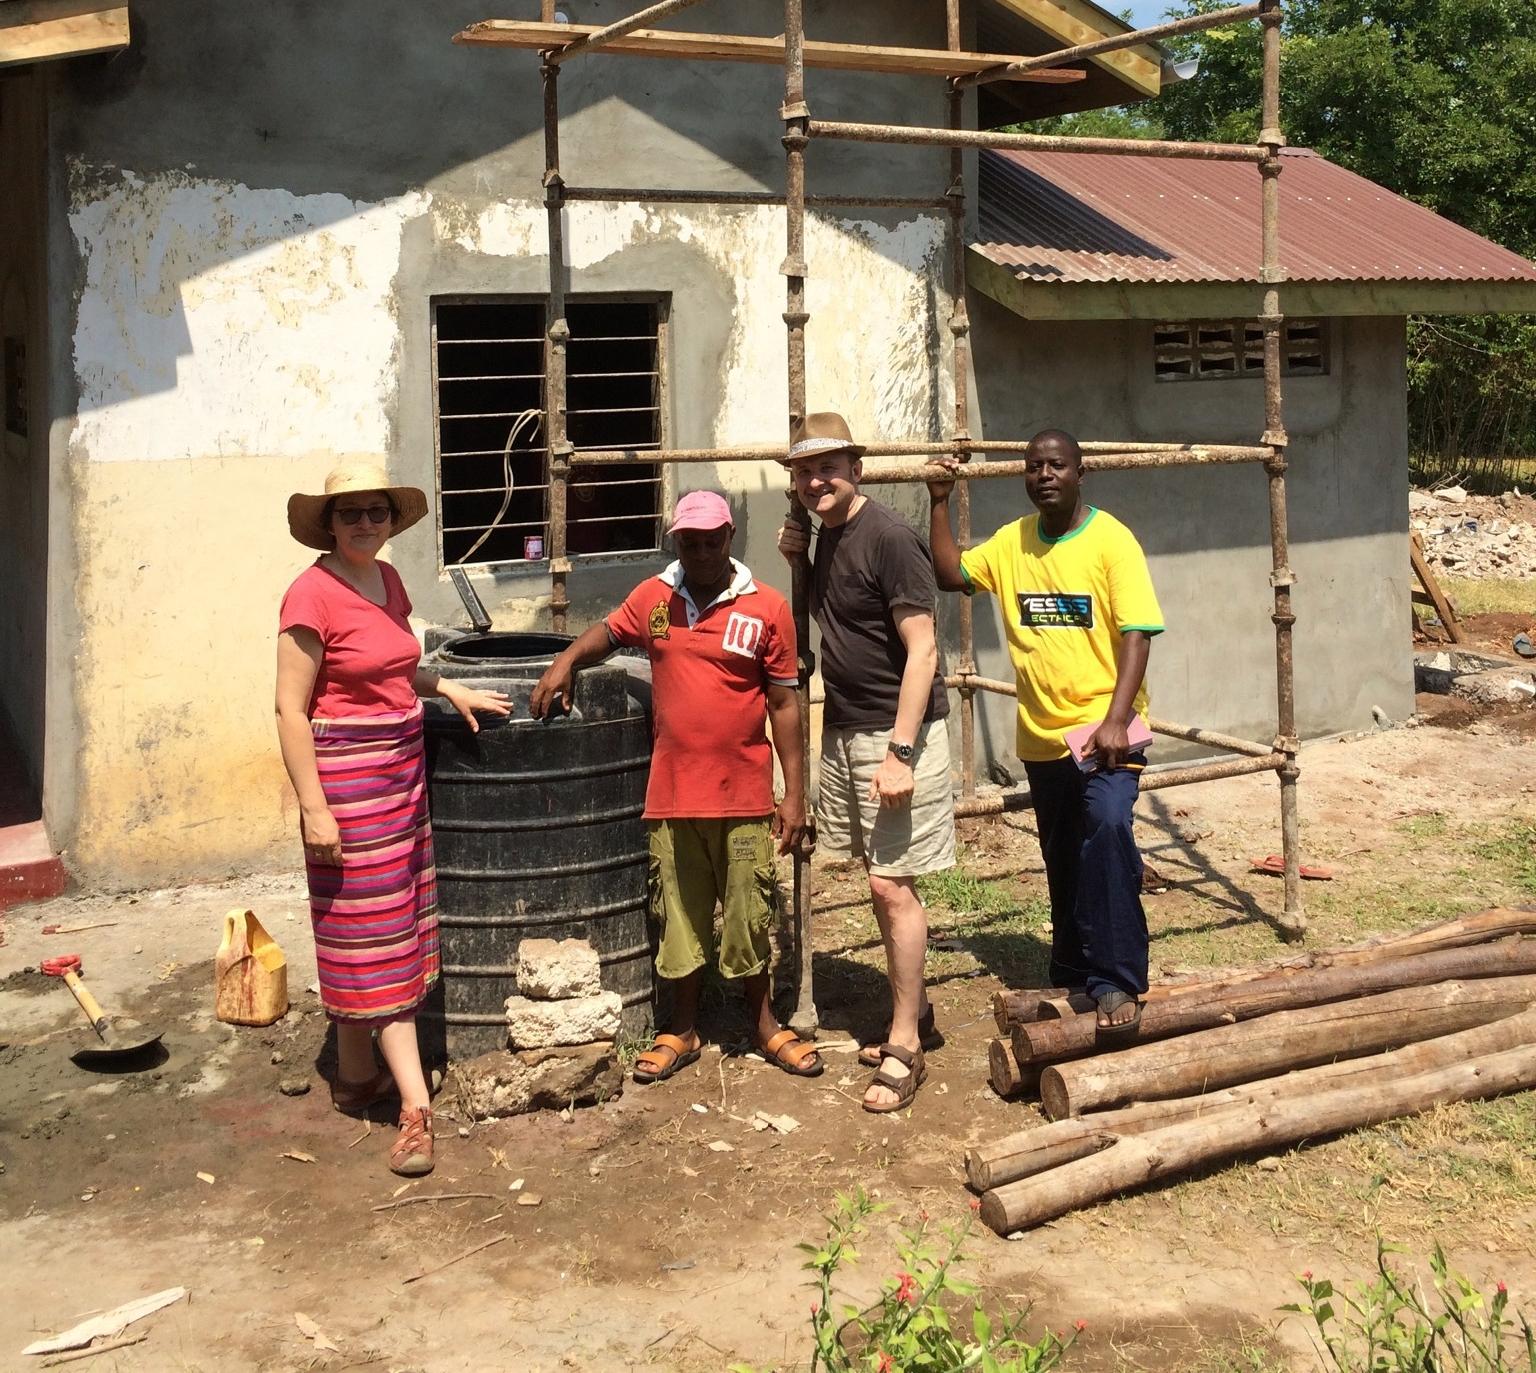 Ashley & Sara Peatfield, Co-Founders of Funzi Bodo working on a project.